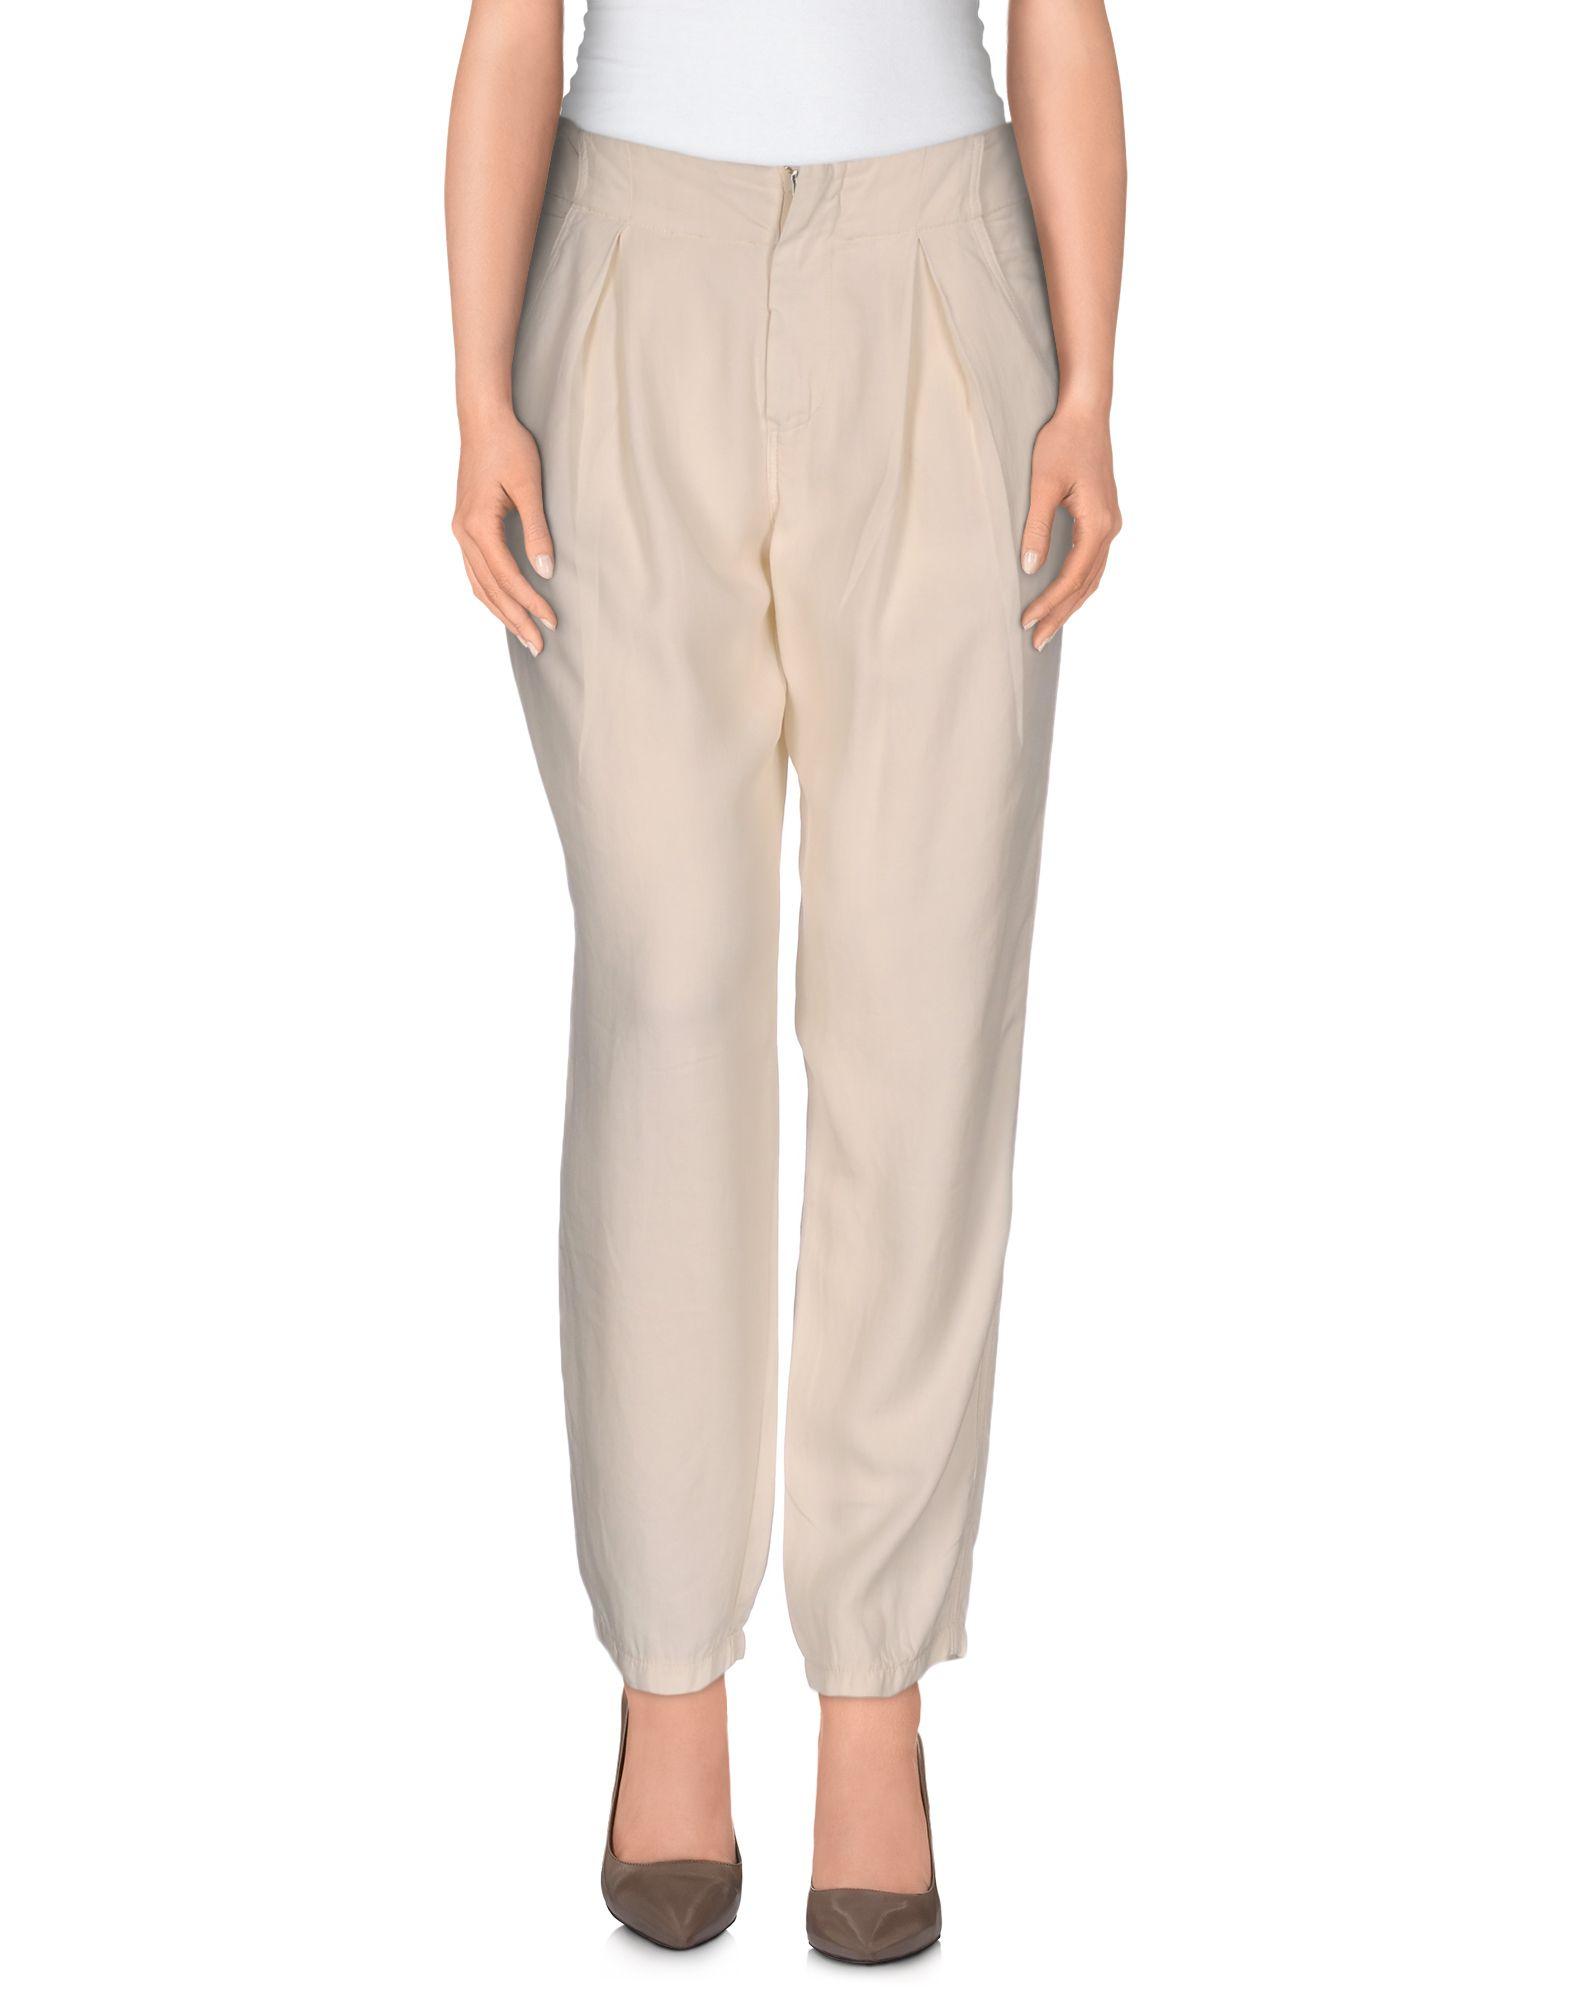 MISS MISS by VALENTINA Повседневные брюки топ miss selfridge miss selfridge mi035ewvqn62